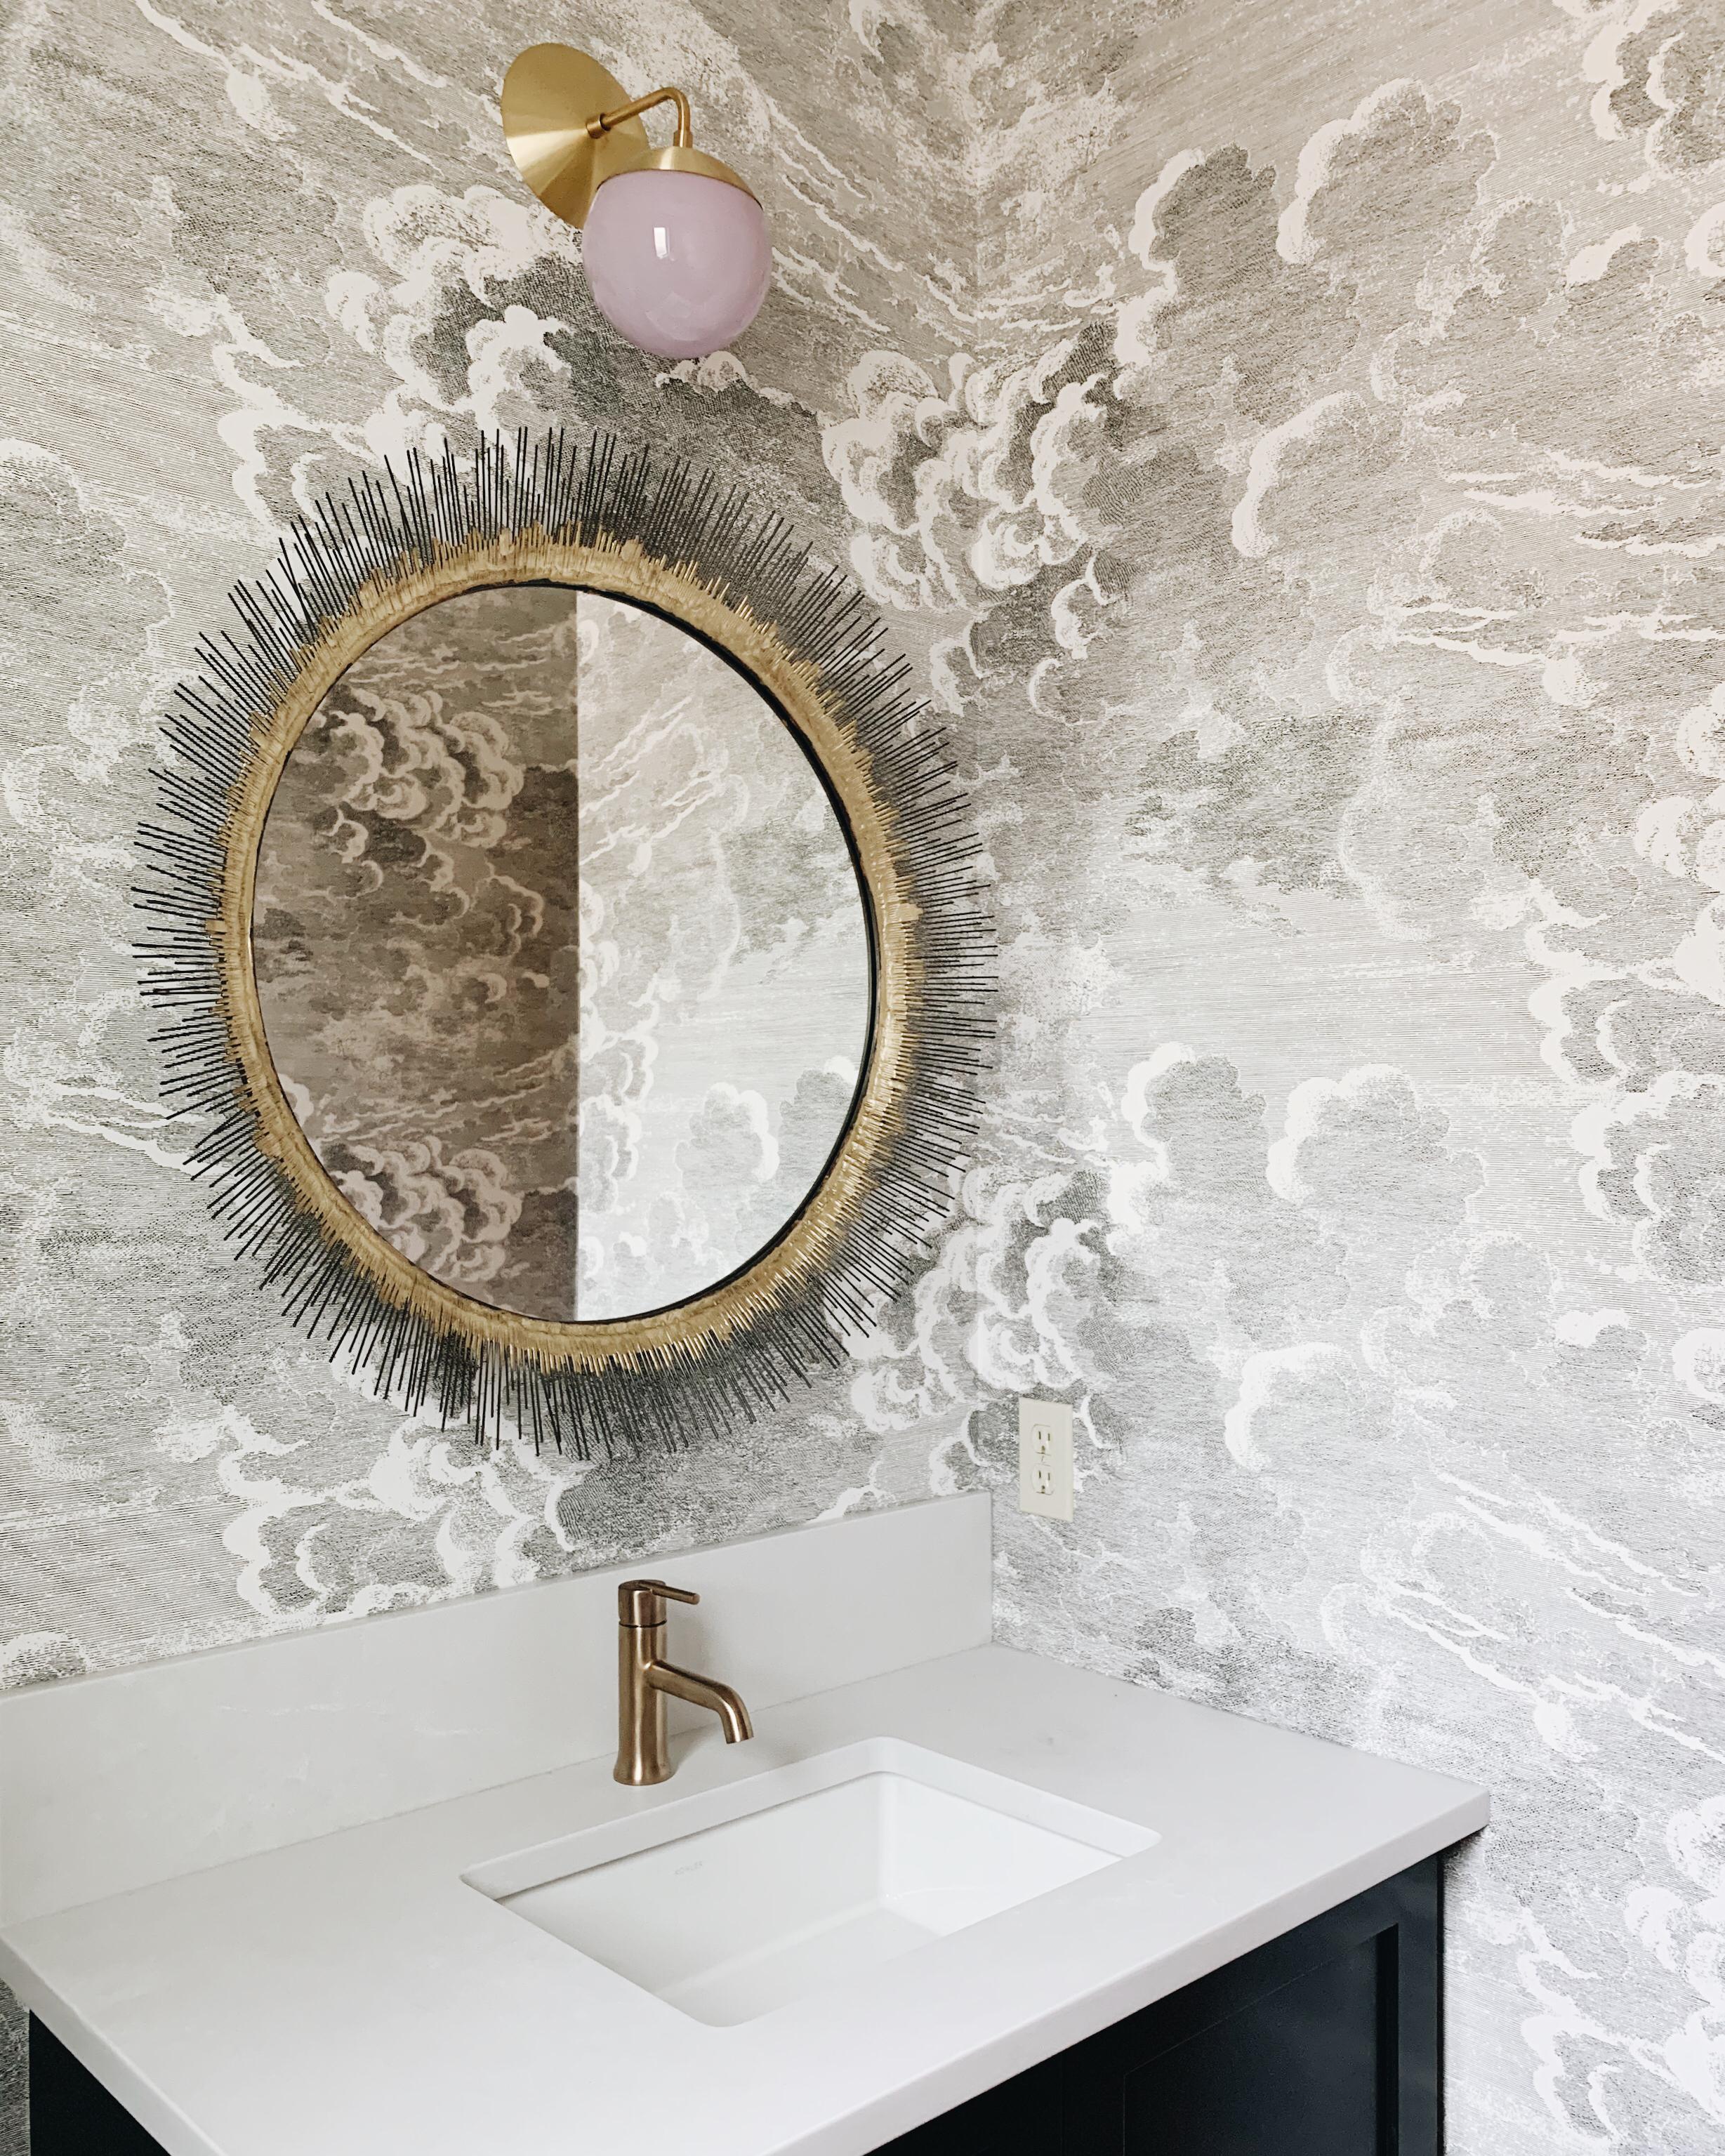 Project Sneak Peek, Powder Room Renovation, Calgary Interior Designer, Nyla Free Designs, #cloudswallpaper #coleandsons #powderroom #renovate